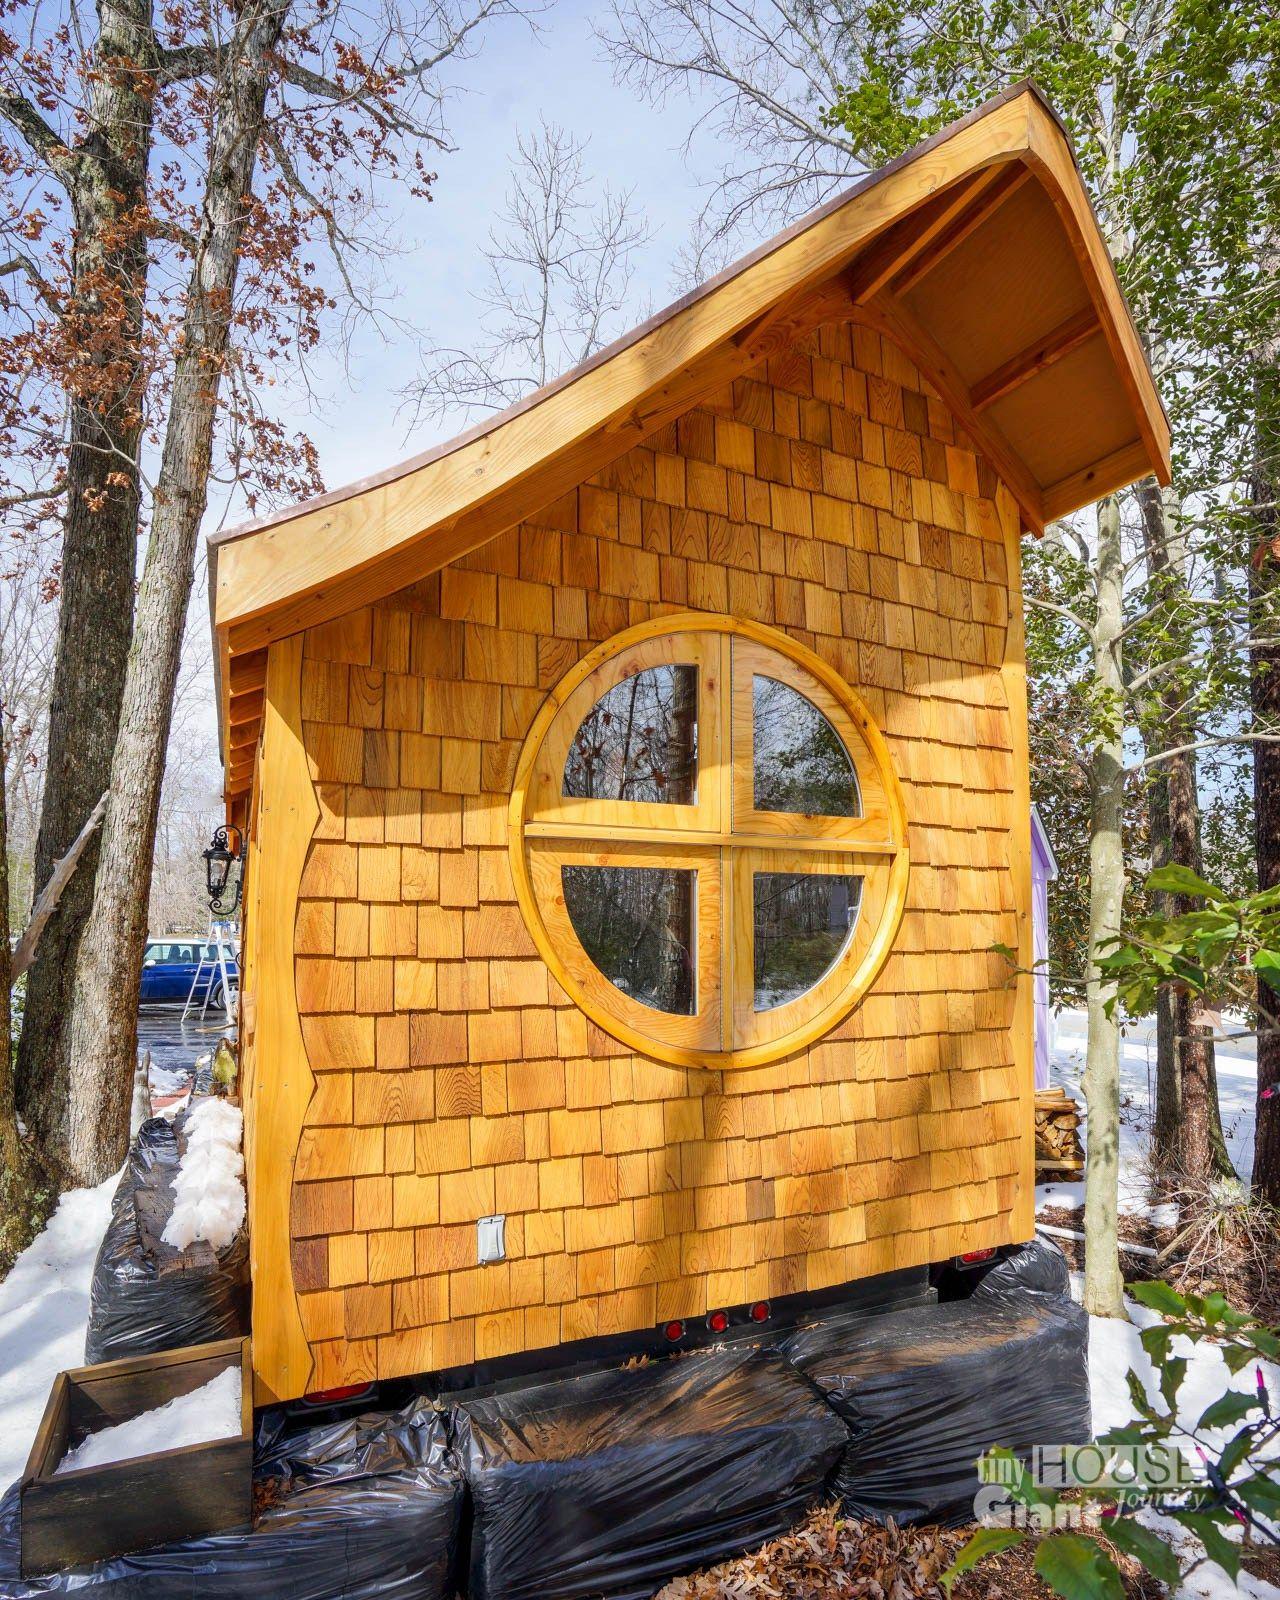 The Pinafore: A Whimsical Tiny House   Dream house   Tiny house